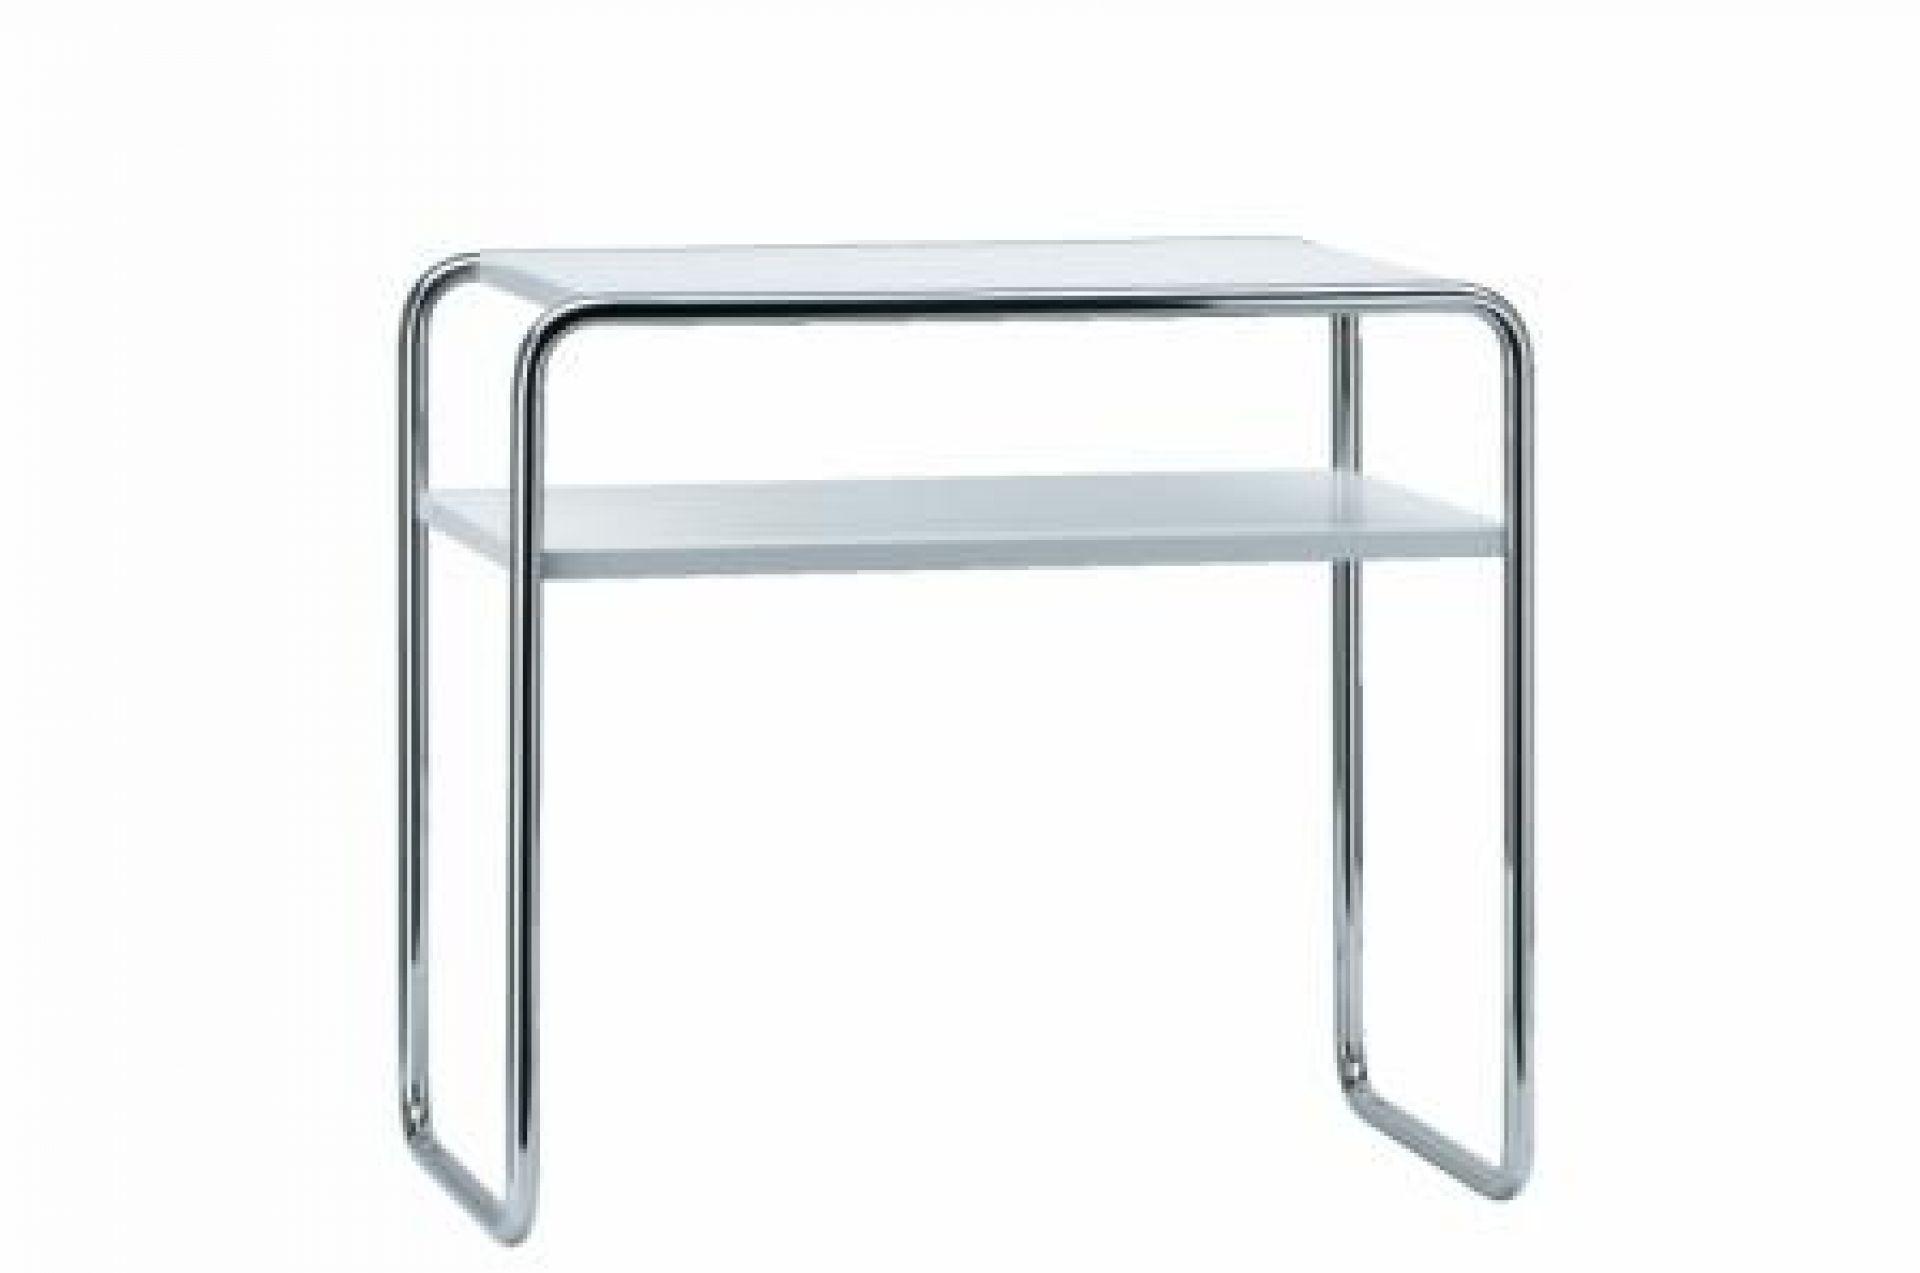 B 9 d/1 side table Thonet